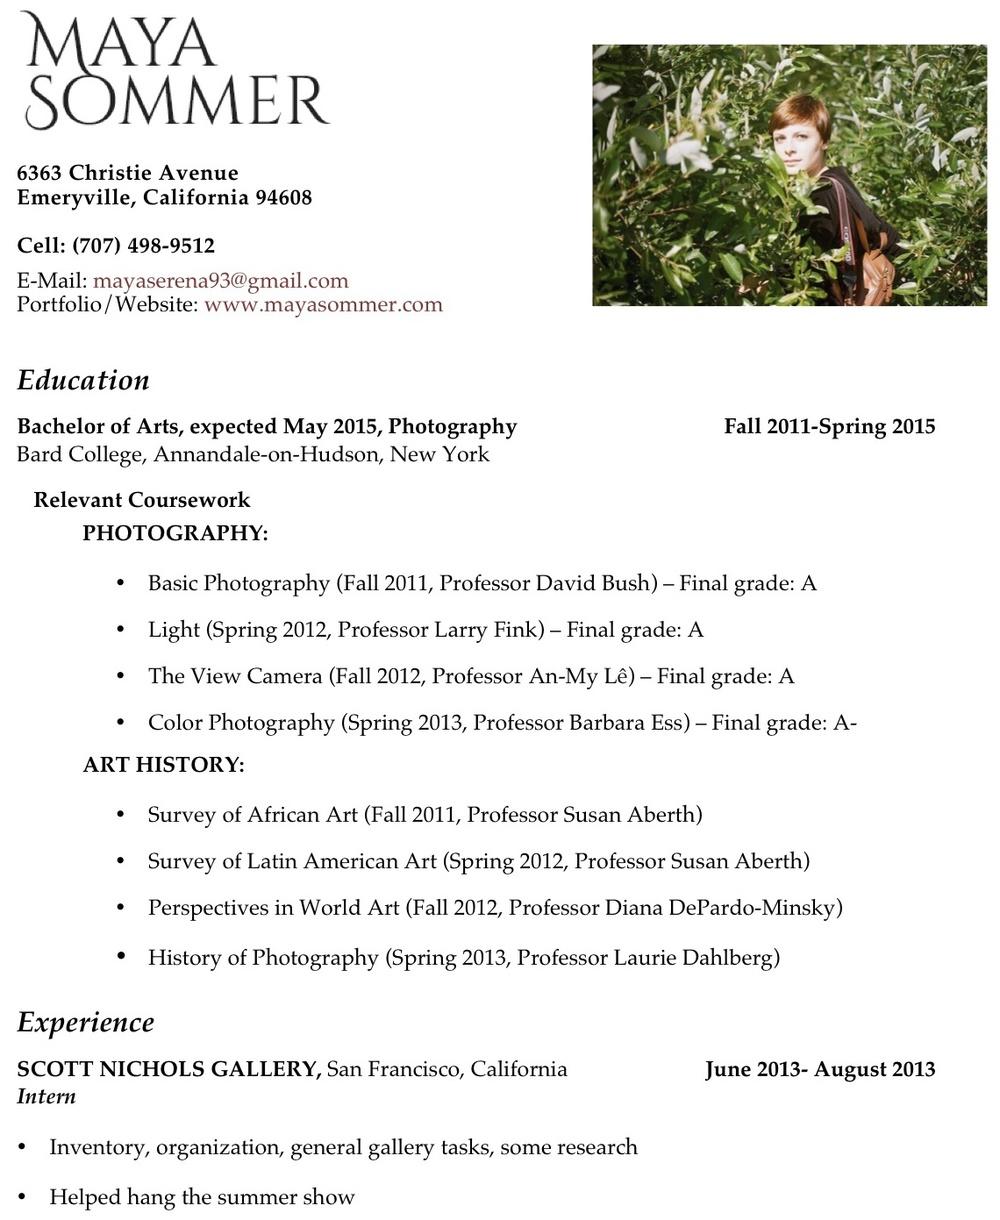 Web resume page 1.jpg